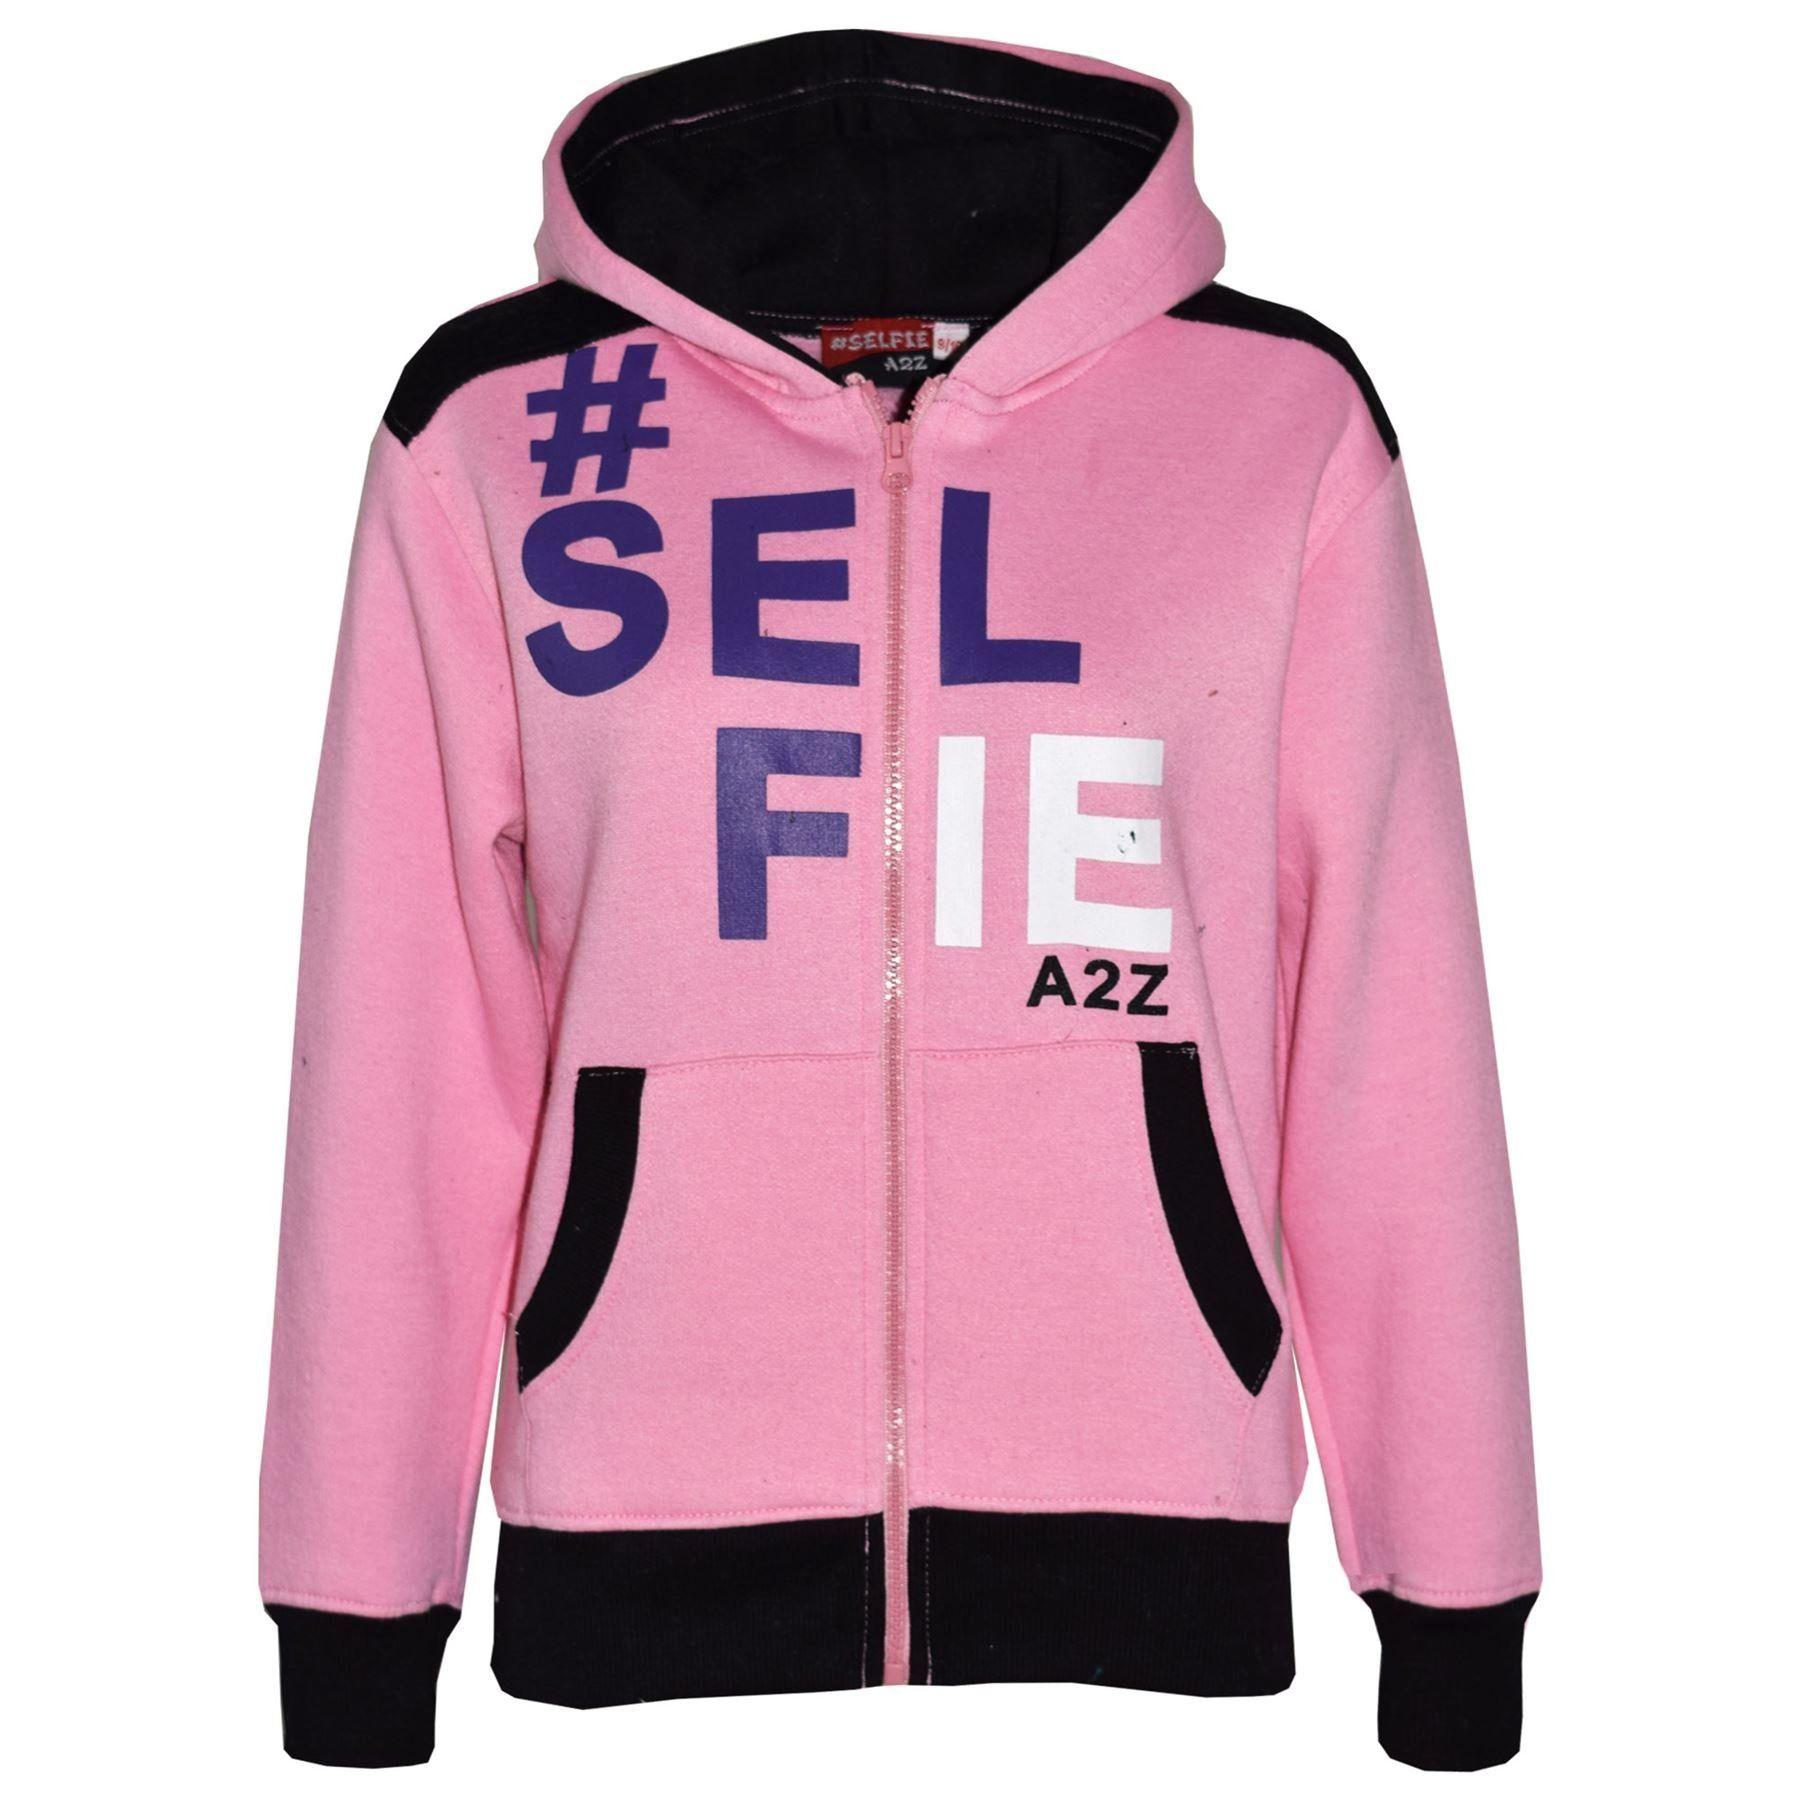 0a92fc588477 Kids Girls Boys Designer #Selfie Jogging Suit Hooded Tracksuit Tops Joggers  7-24.